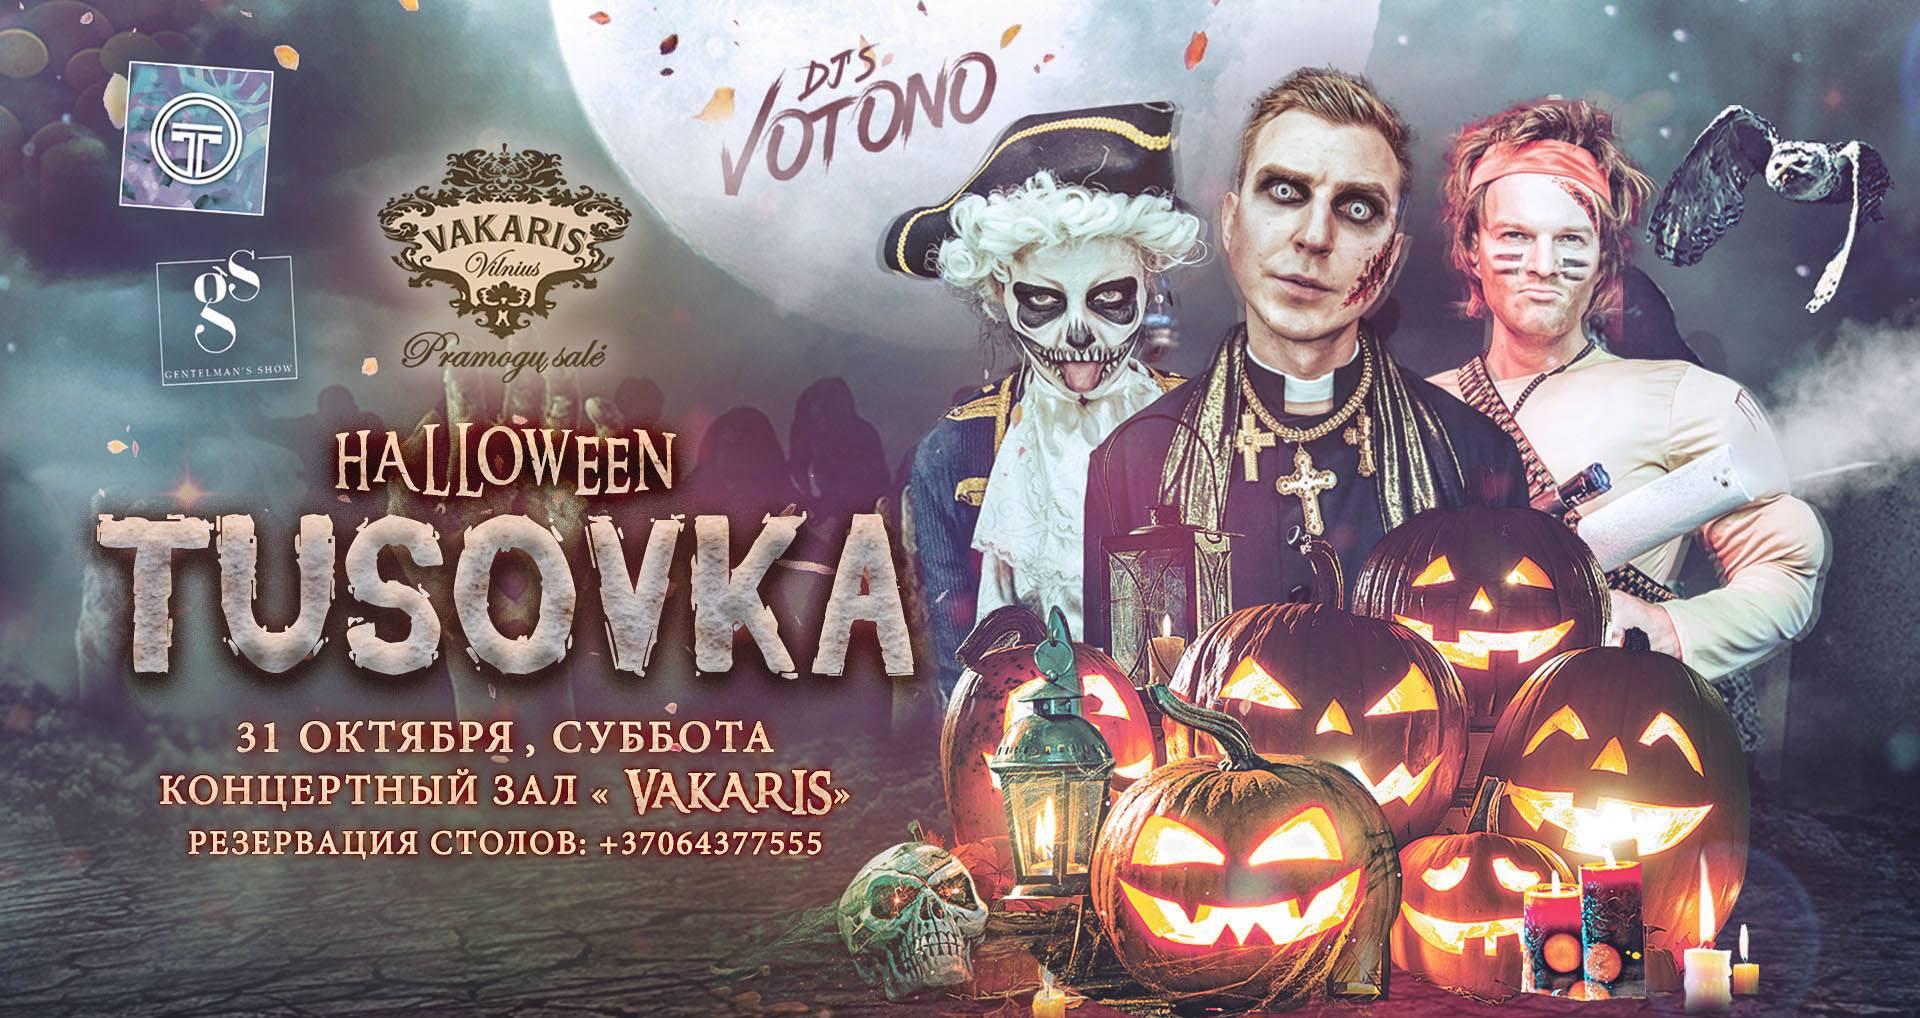 Тусовка – Halloween 2020!